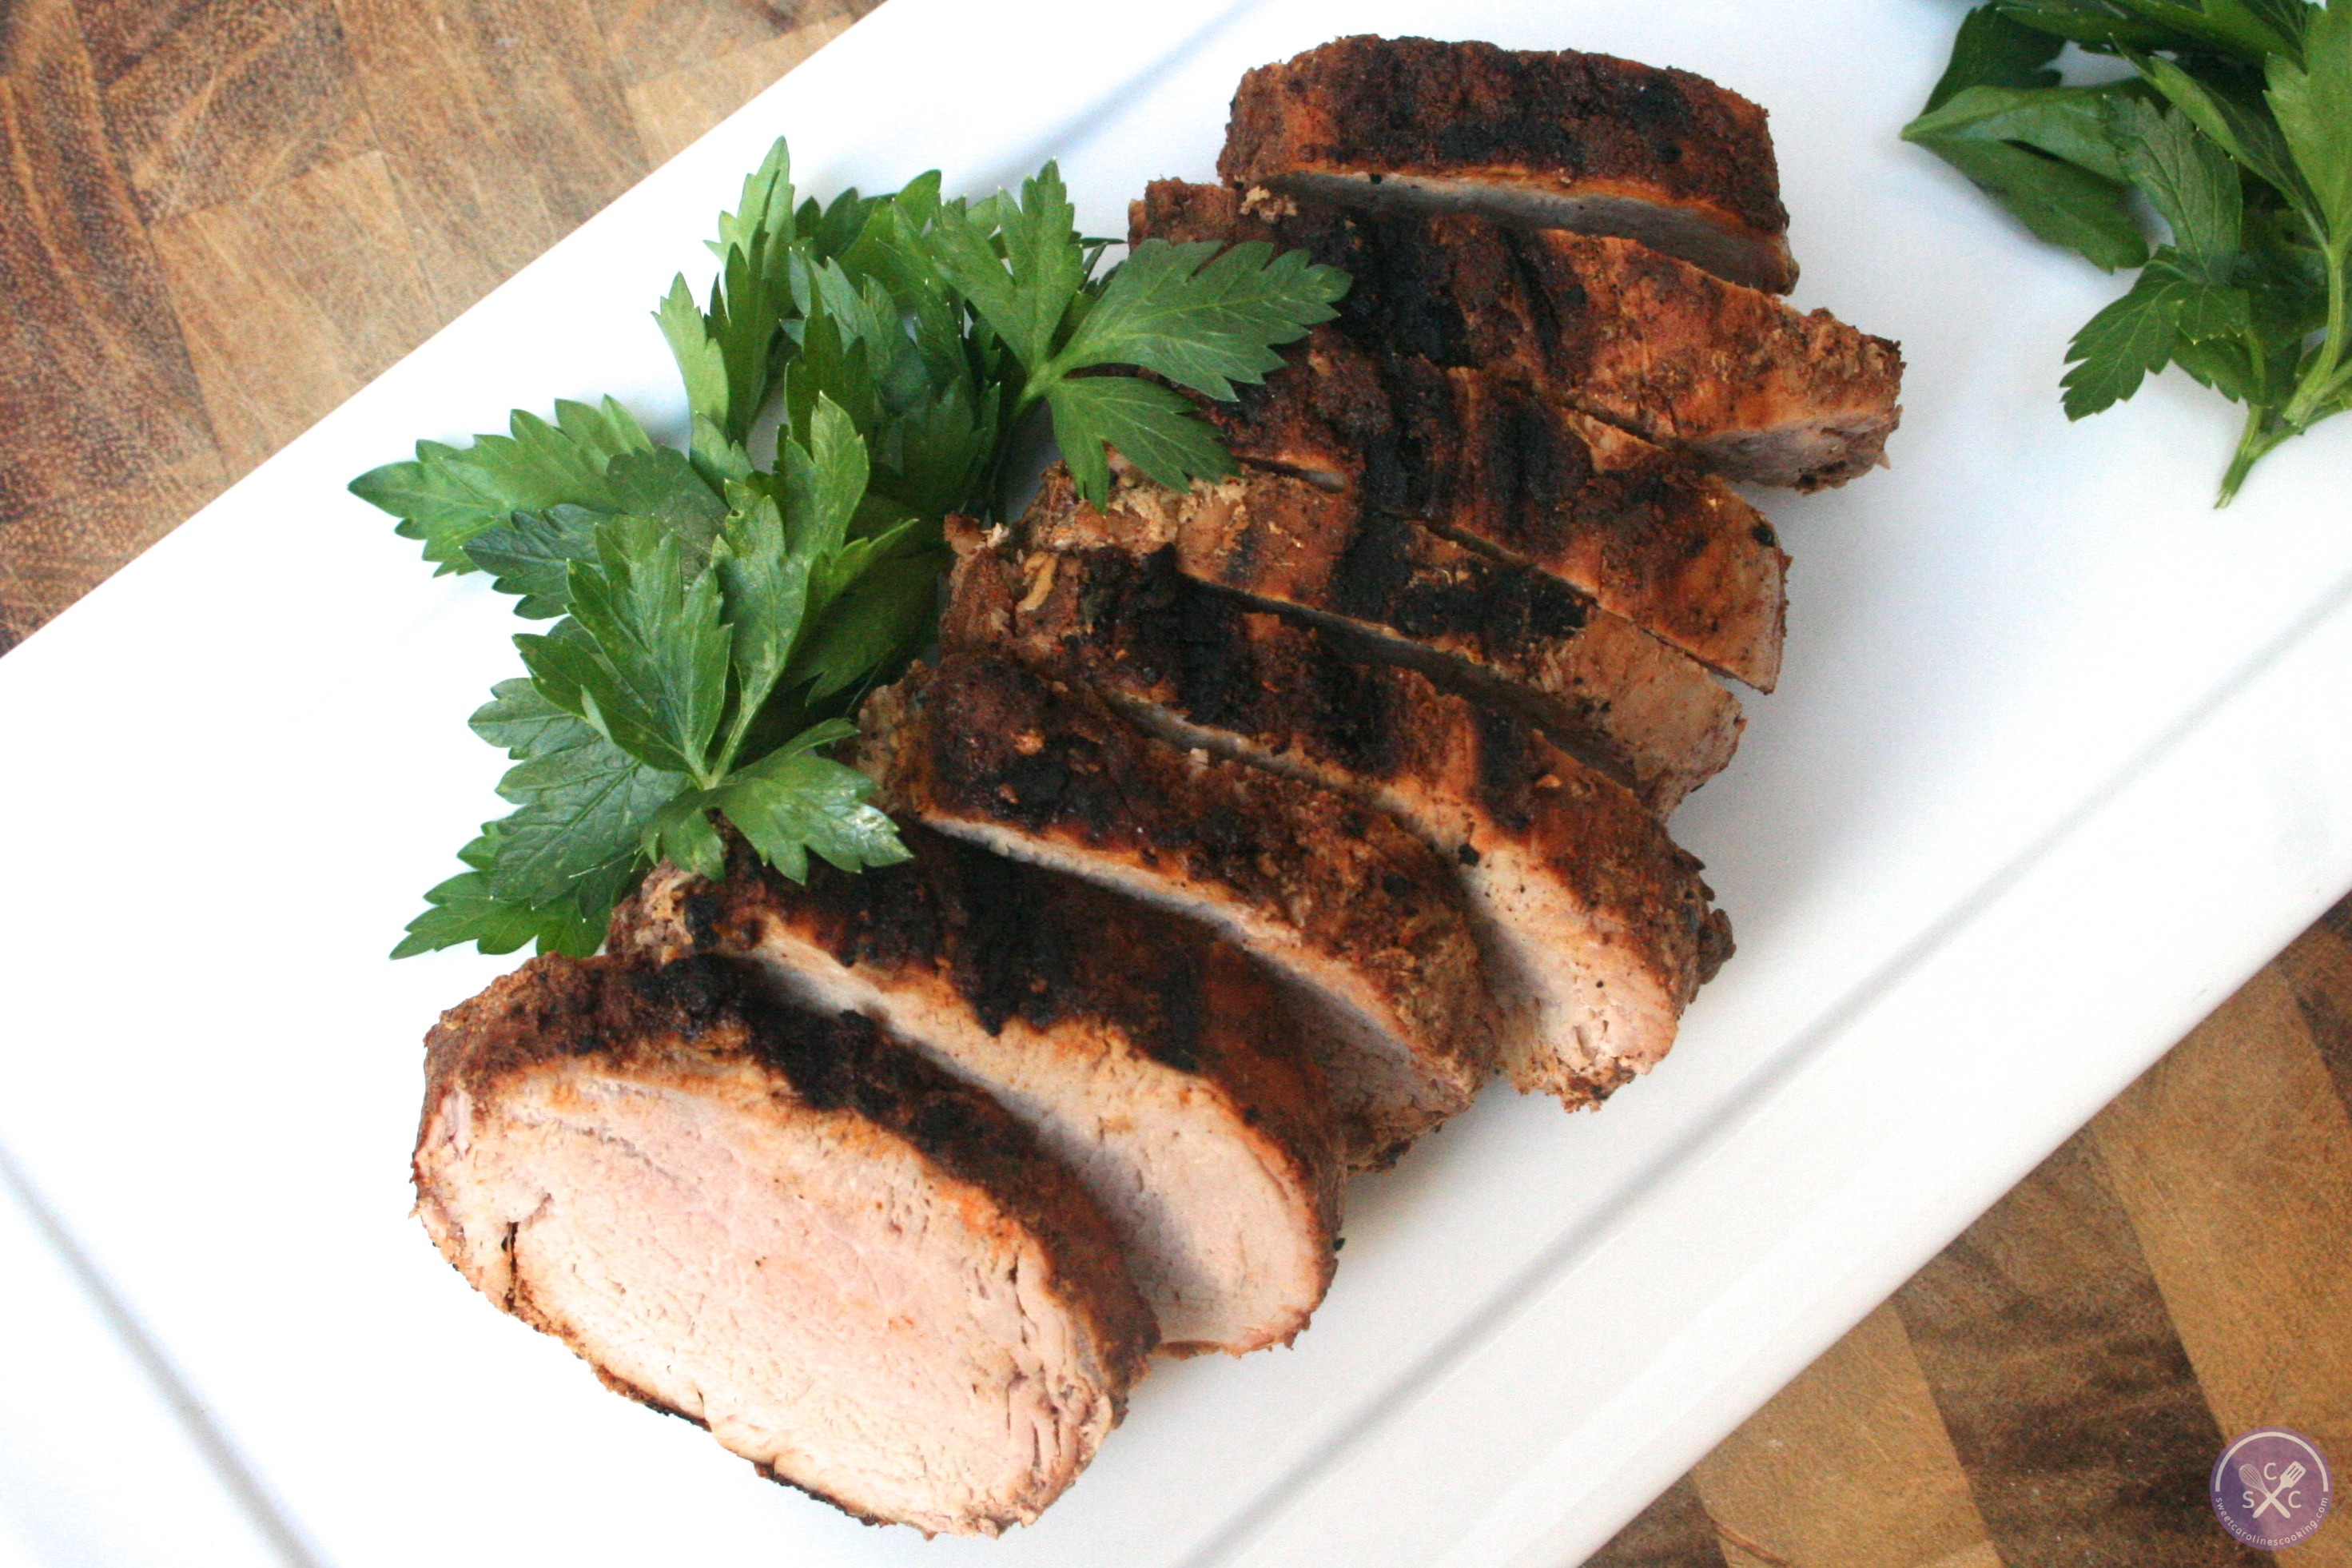 ... chile & brown sugar-rubbed pork tenderloin] - sweet caroline's co...